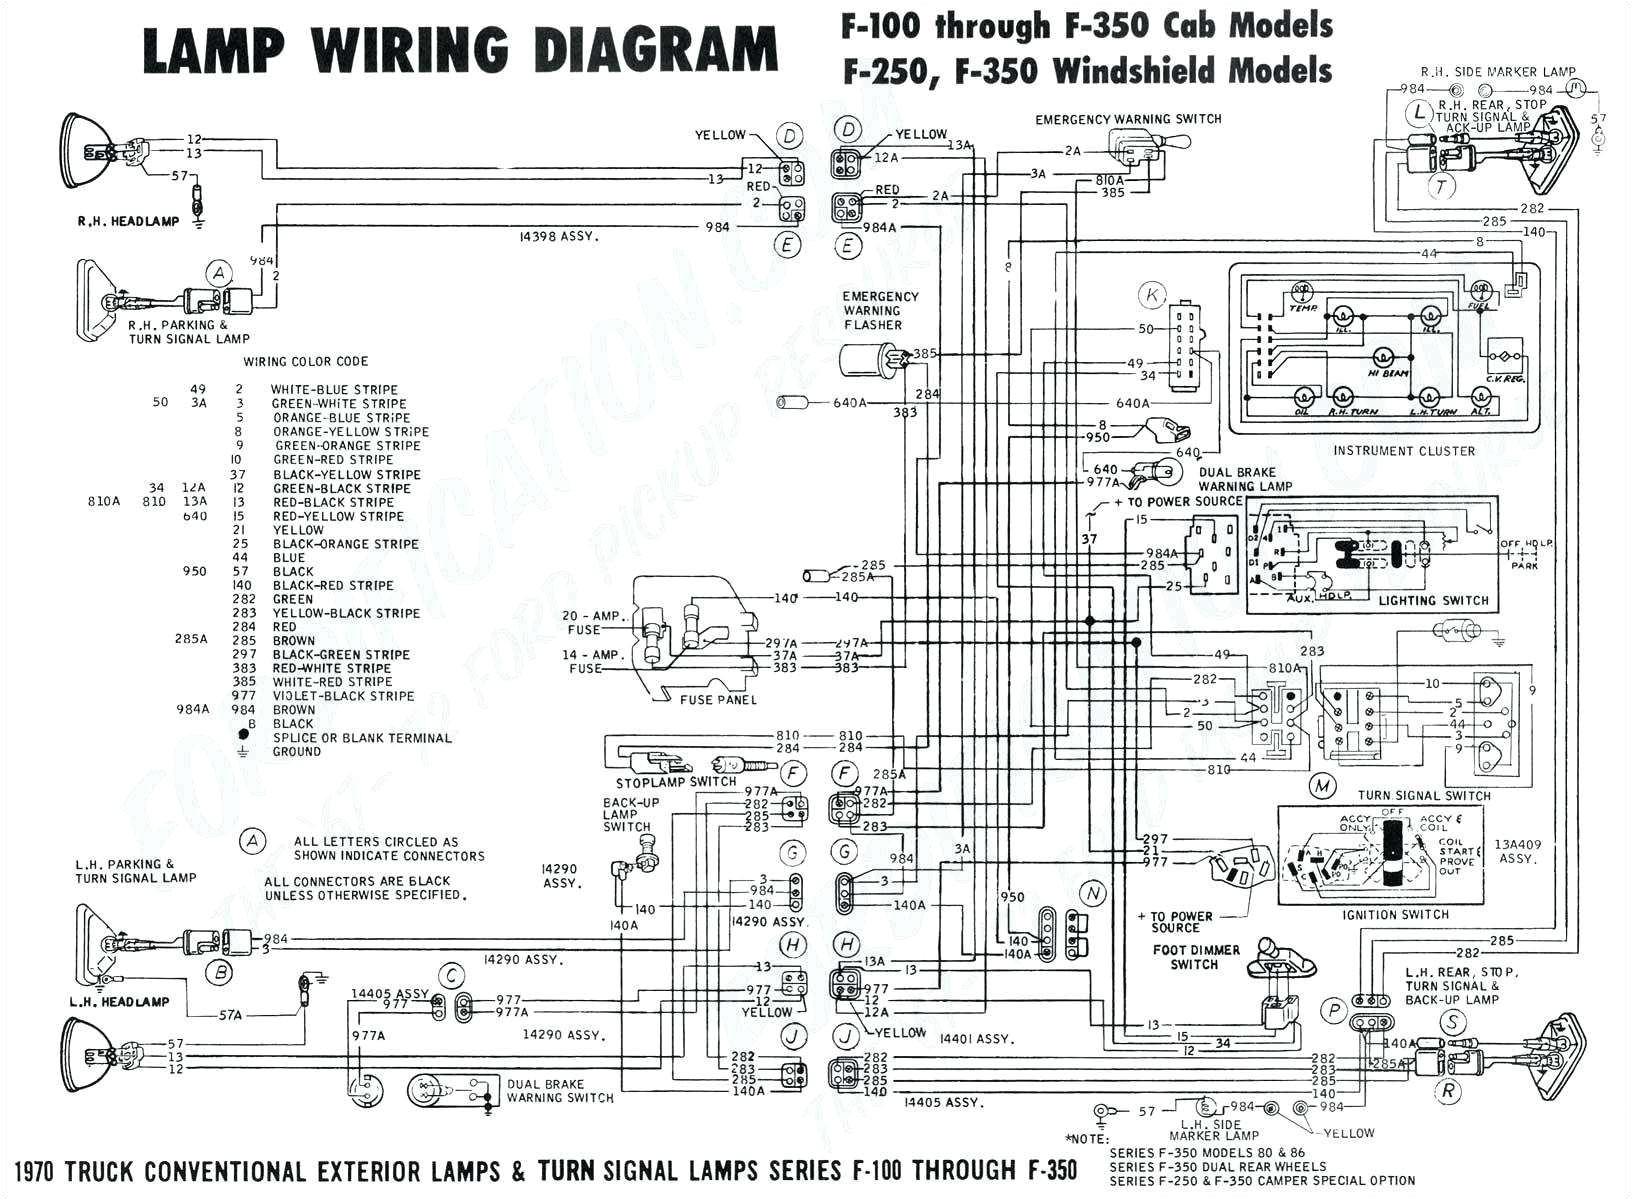 2004 dodge ram fuse box wiring diagram post 1999 dodge ram fuse box diagram turn wiring